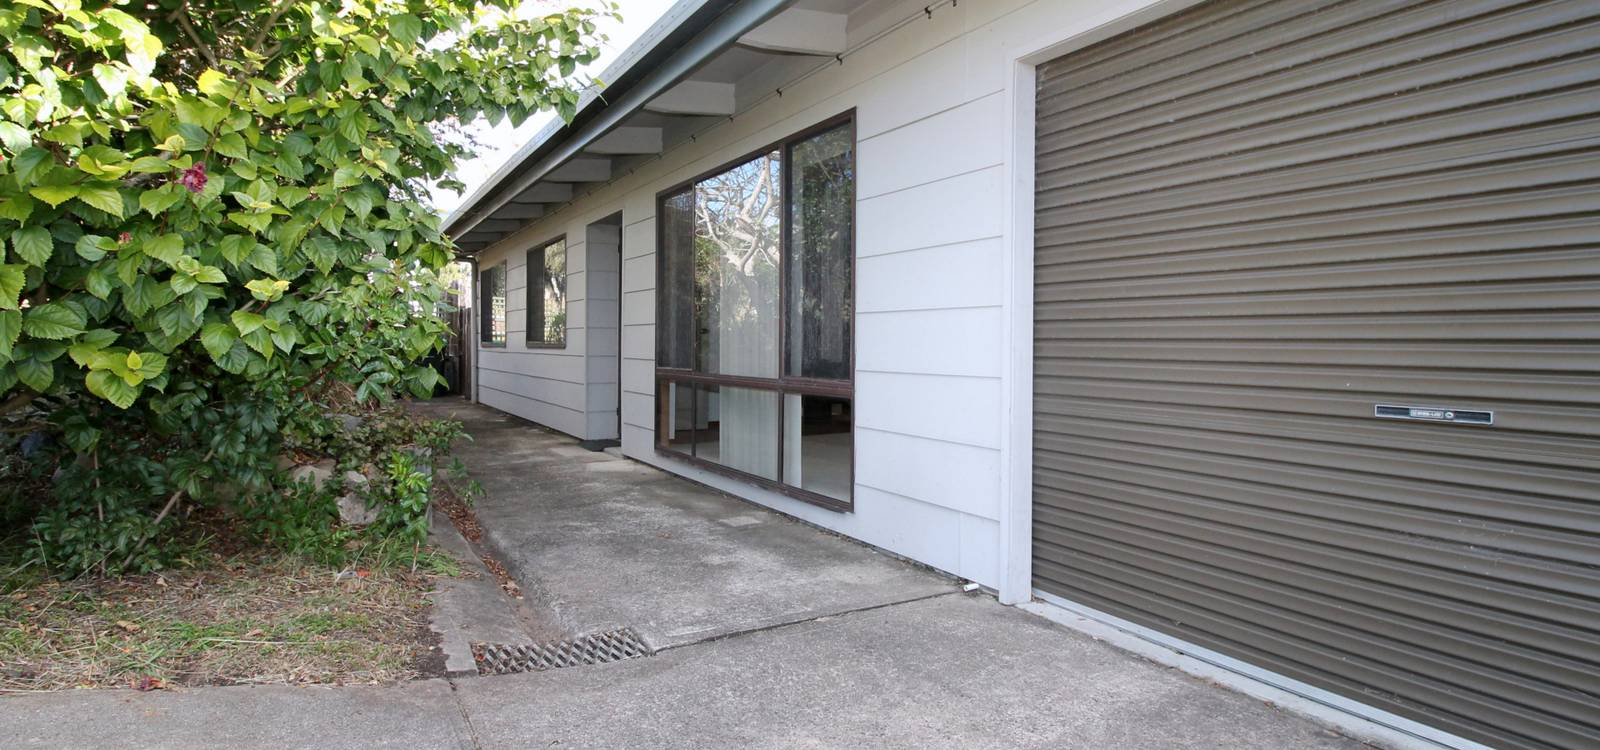 26 Anderson Avenue TUROSS HEAD, NSW 2537 - photo 1